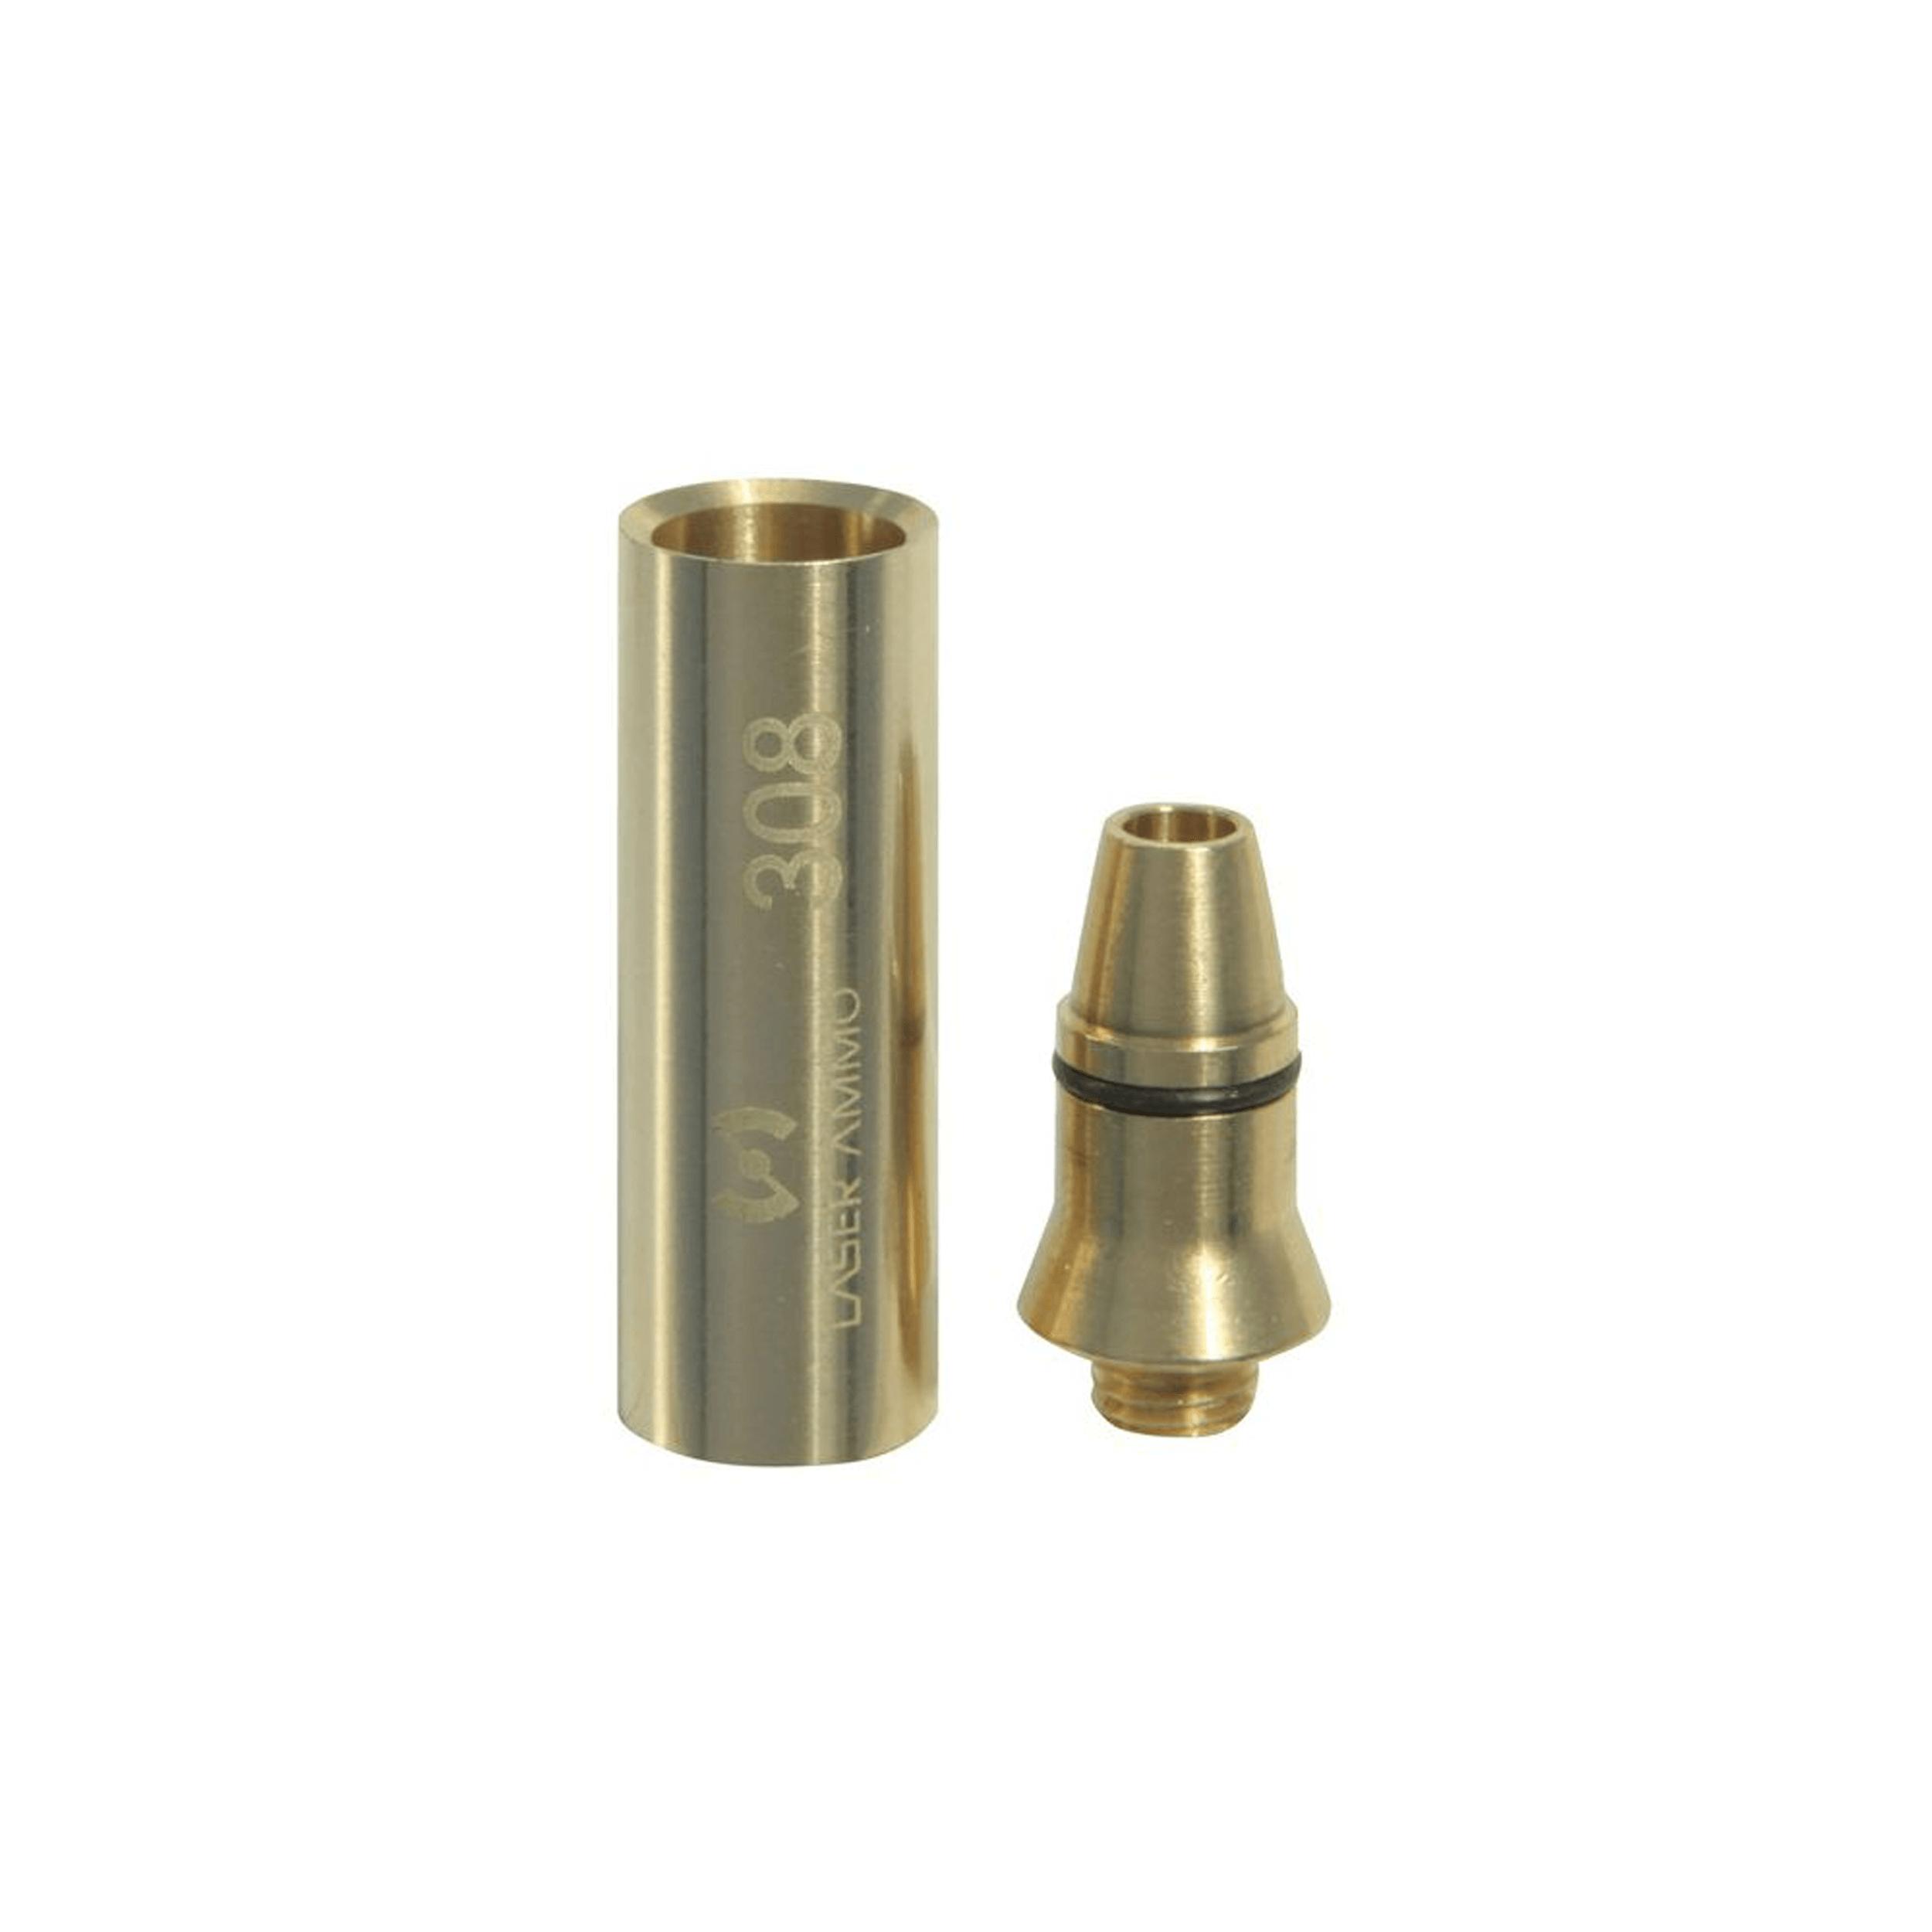 7.62X51 mm / .308 WIN Rifle Adapter sleeve